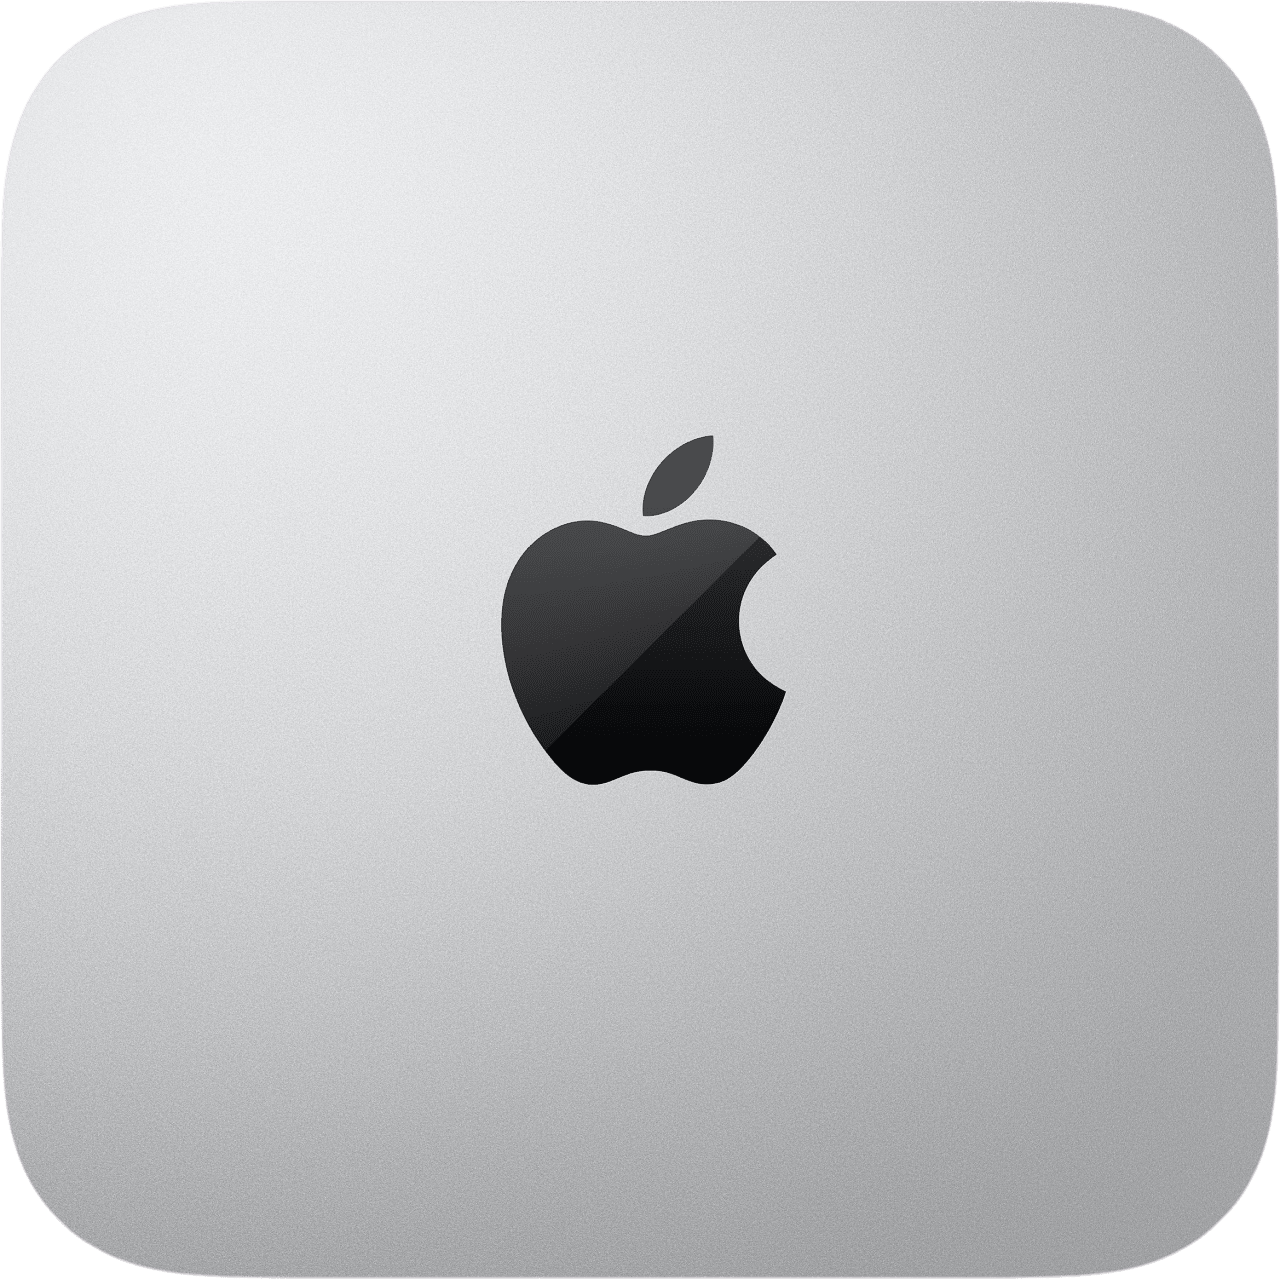 Silver Apple Mac mini (Late 2020) Desktop - Apple M1 - 8GB - 512GB SSD - Apple Integrated 8-core GPU.3